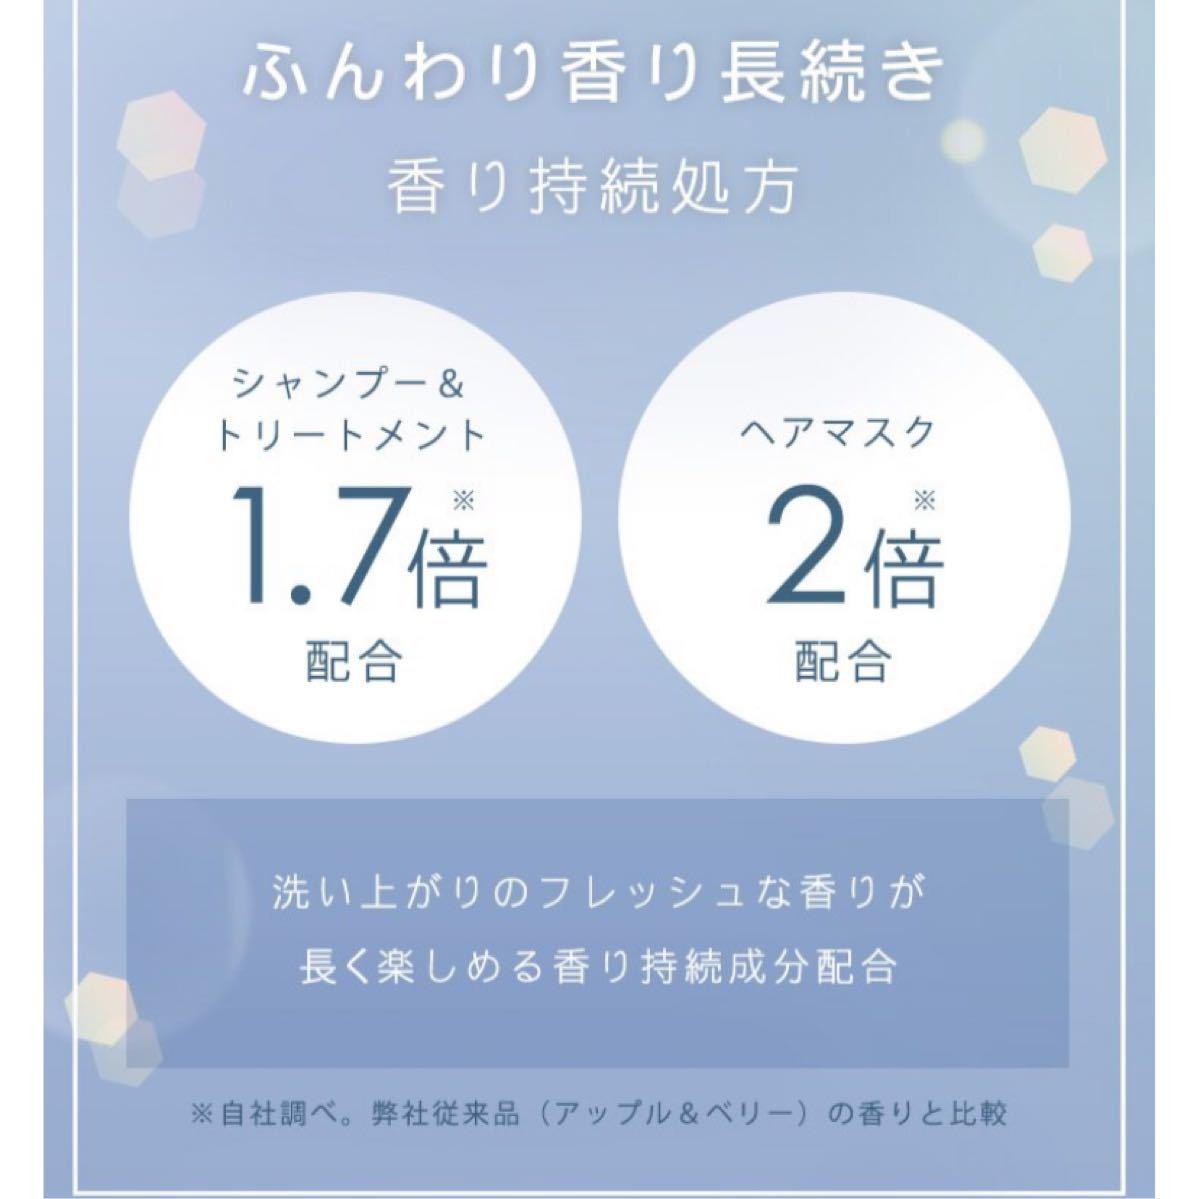 BOTANIST冬季限定モイスト シャンプー/トリートメント/ヘアパック分包